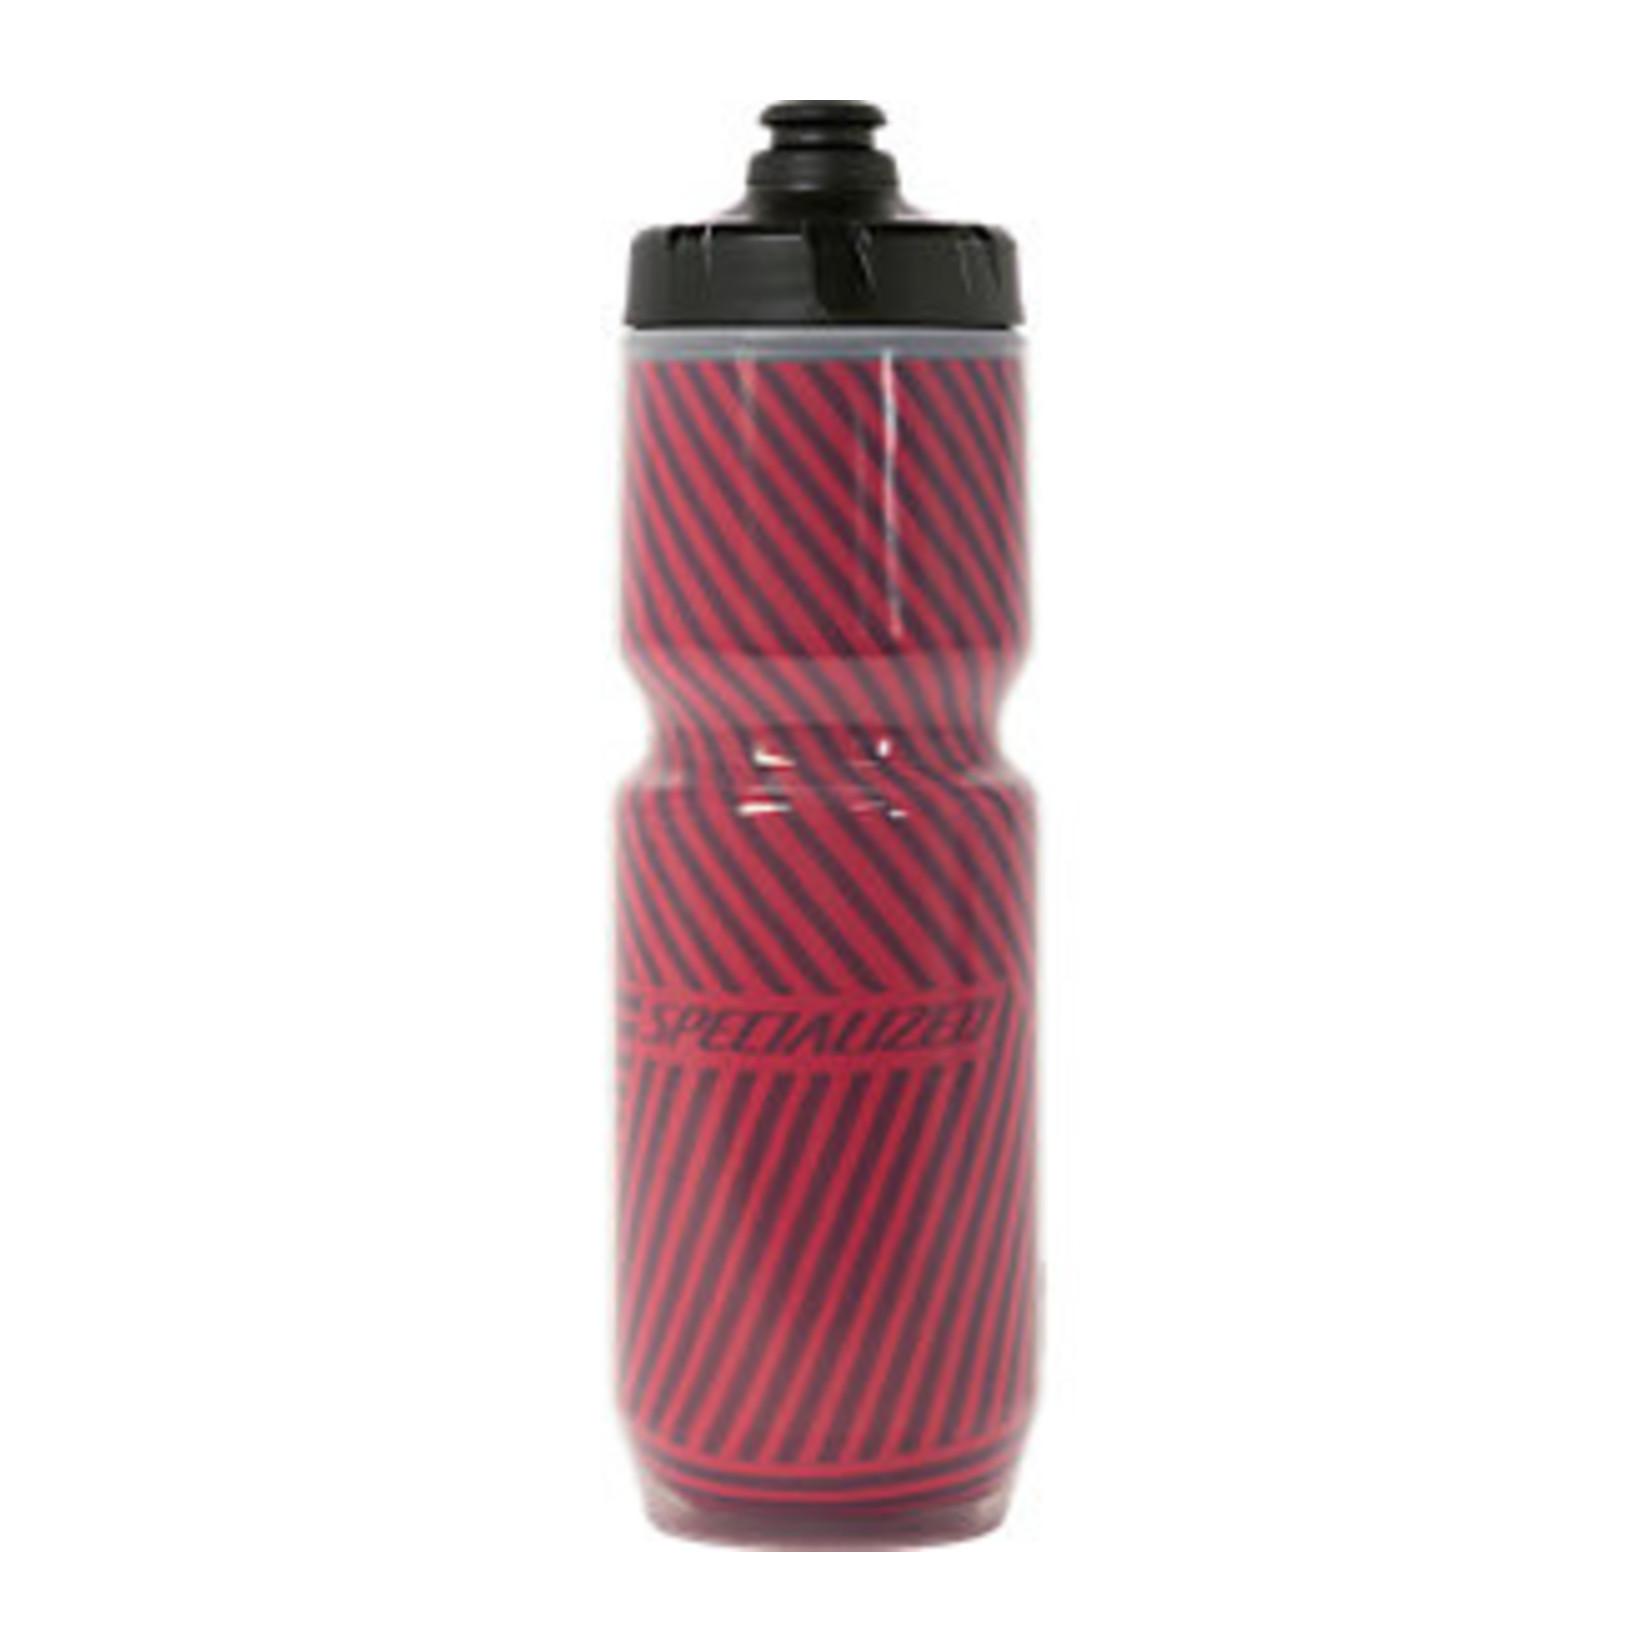 Specialized Specialized Purist Insulated Chromatek MoFlo 23oz Bottle